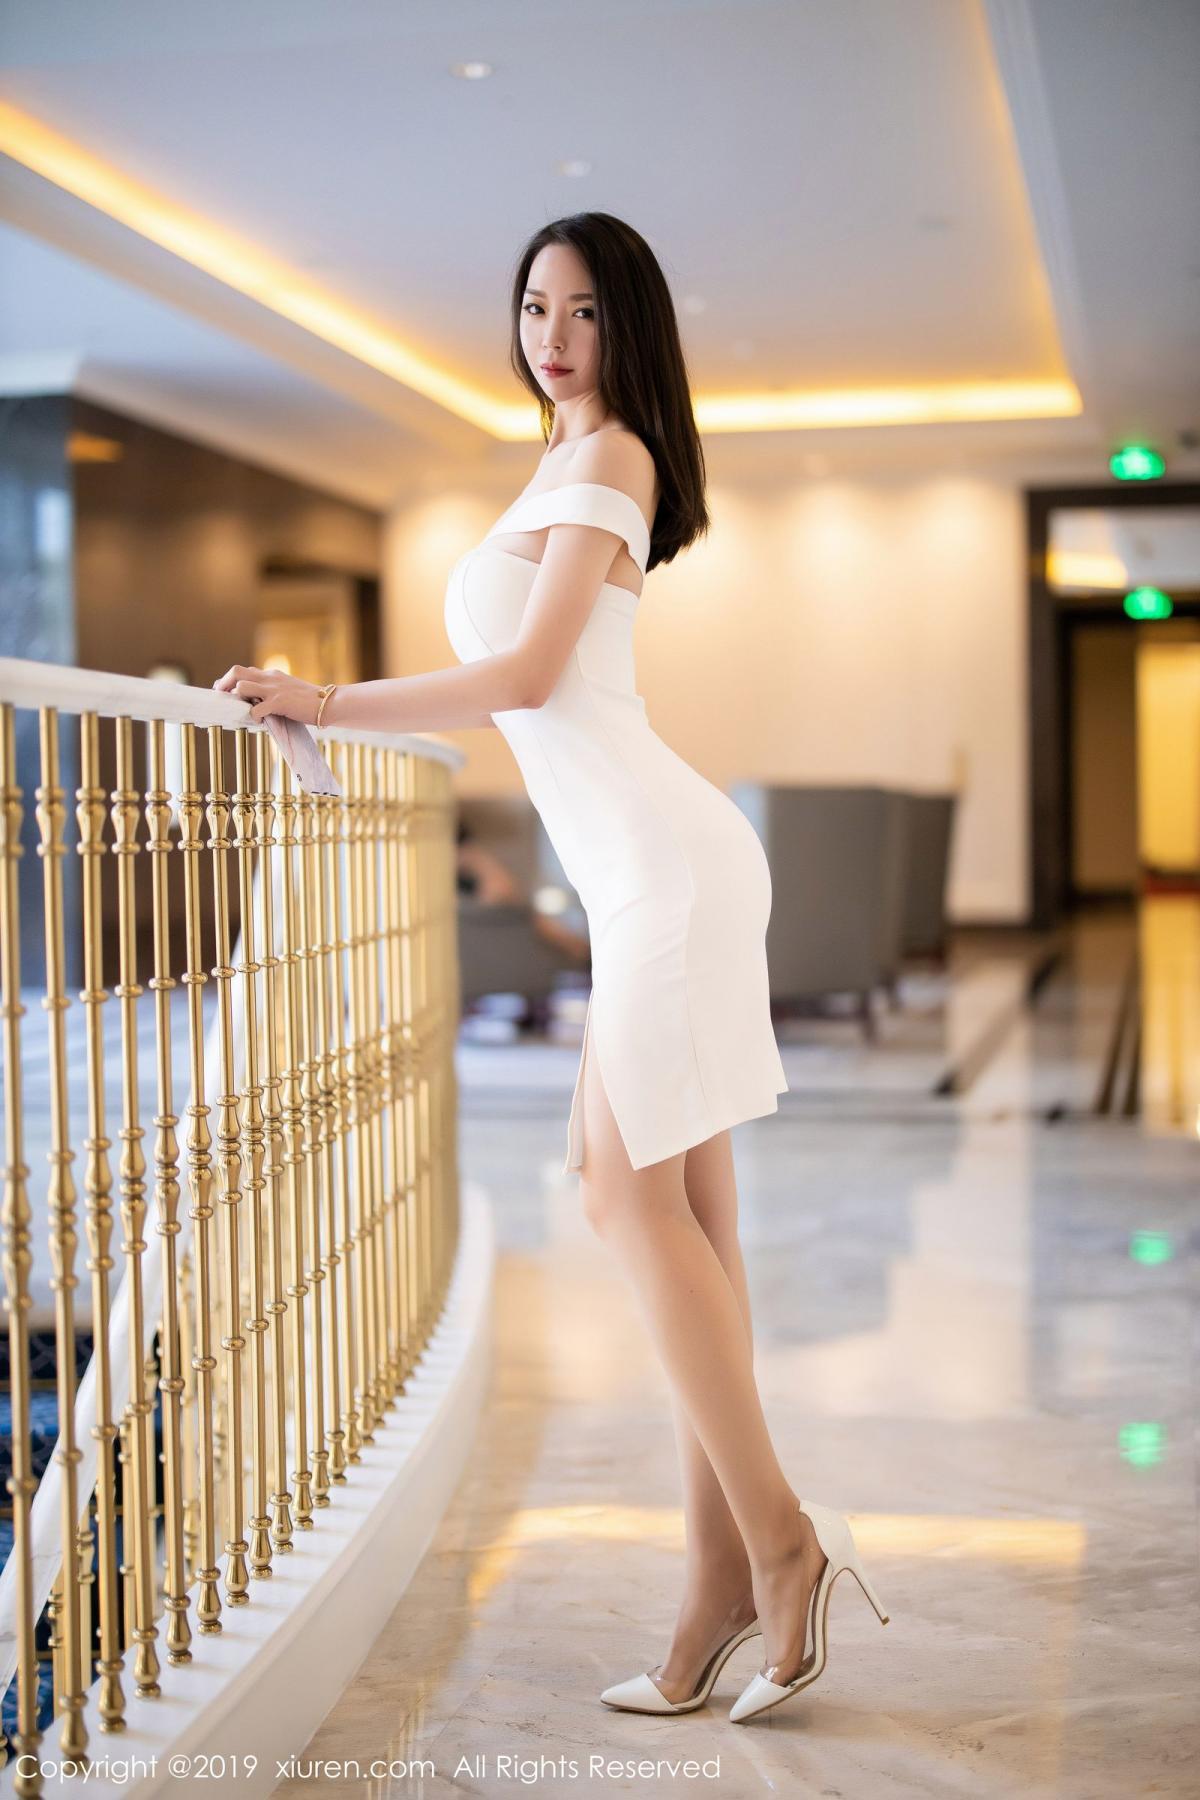 [XiuRen] Vol.1861 Meng Xin Yue 31P, Meng Xin Yue, Tall, Temperament, Uniform, Xiuren